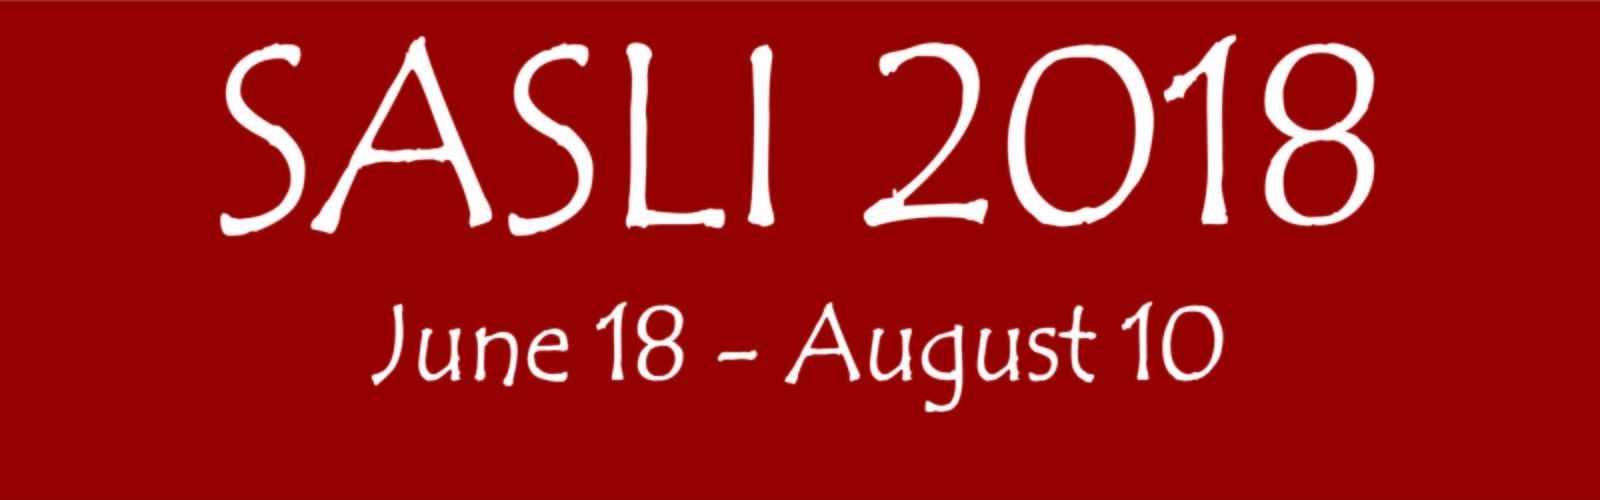 SASLI 2018 June 18-August 10 banner